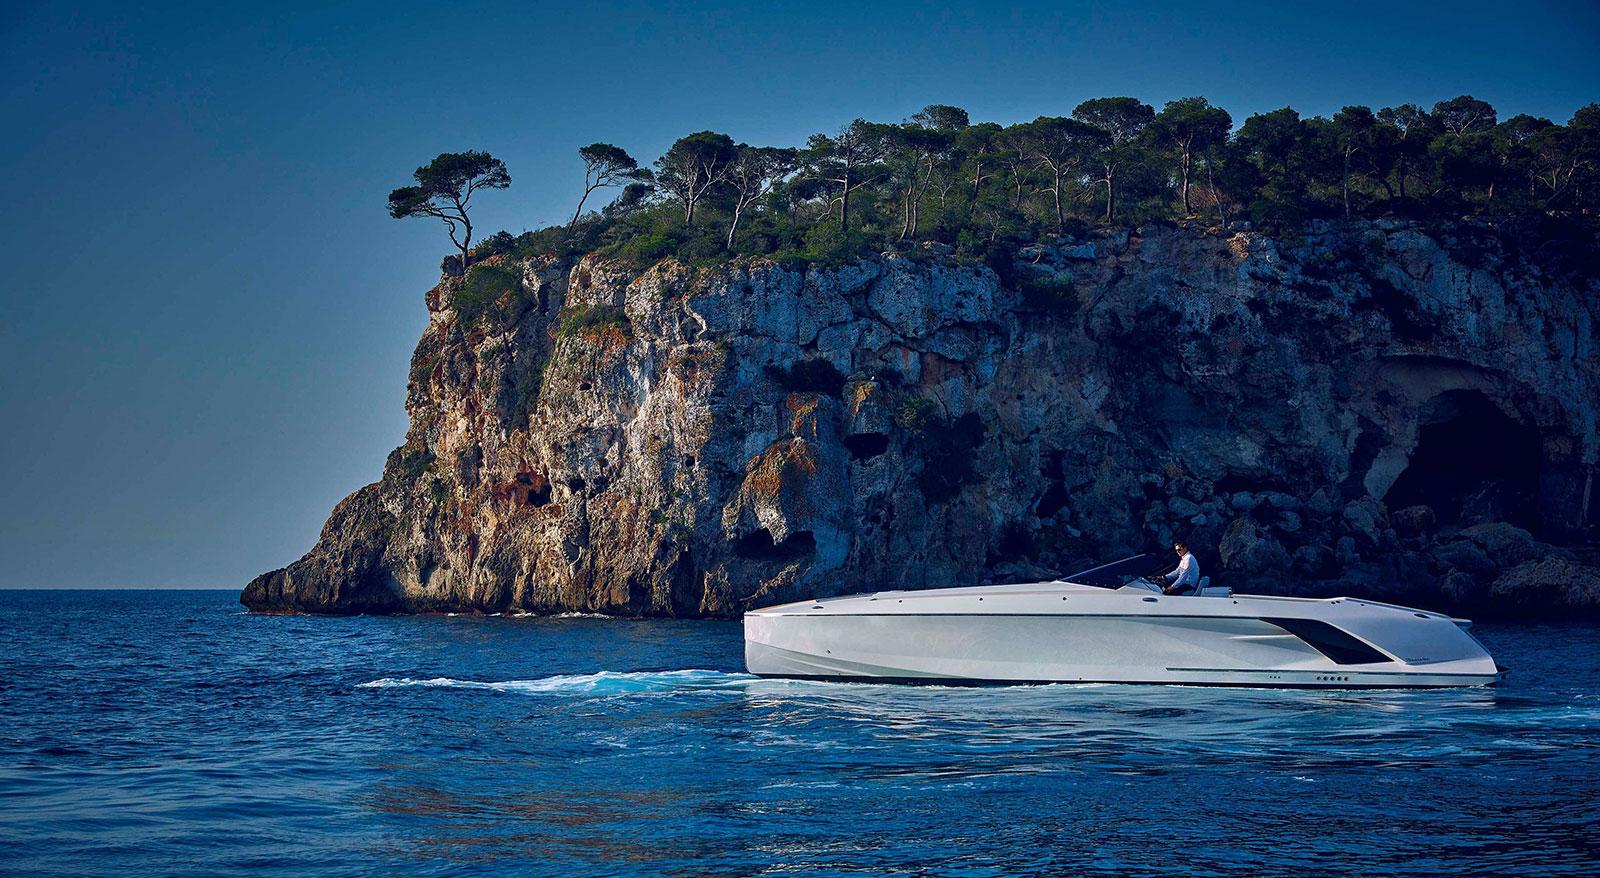 Motorboot-Charter-Mallorca-Motoryacht-Charter-Mallorca-7